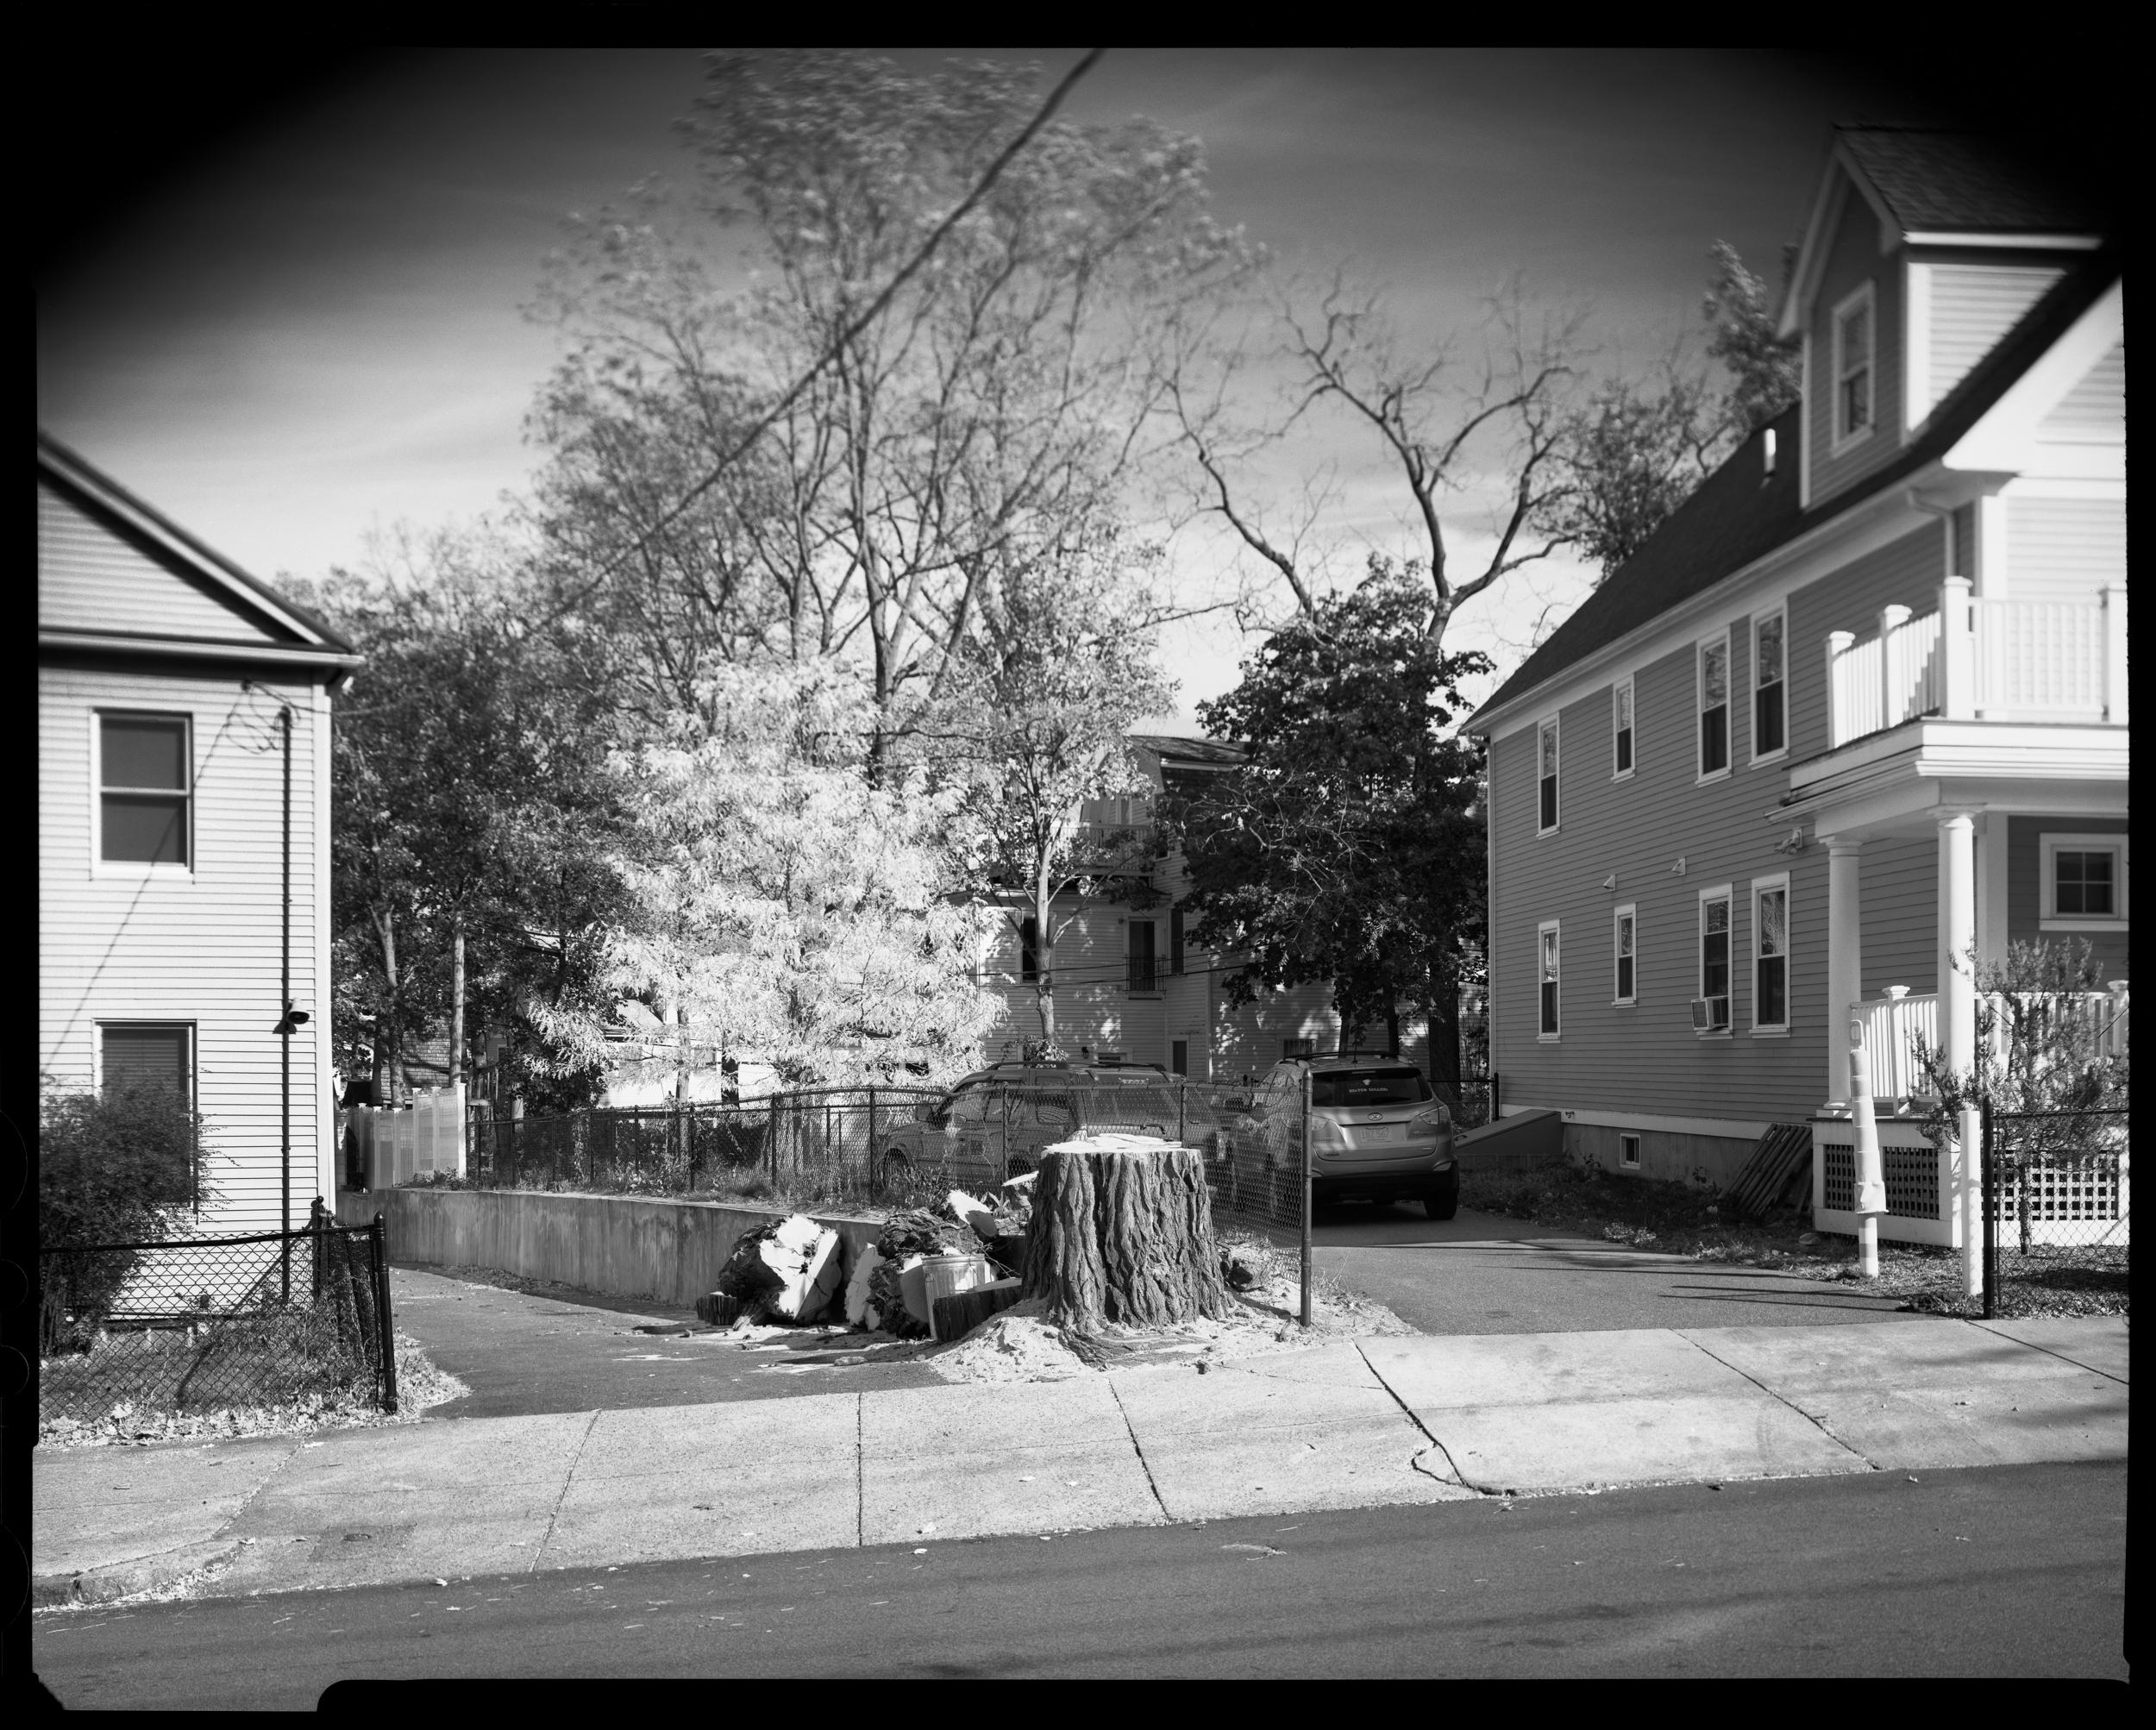 85 - 89 Cedar St, Fort Hill, Roxbury, MA, 2015